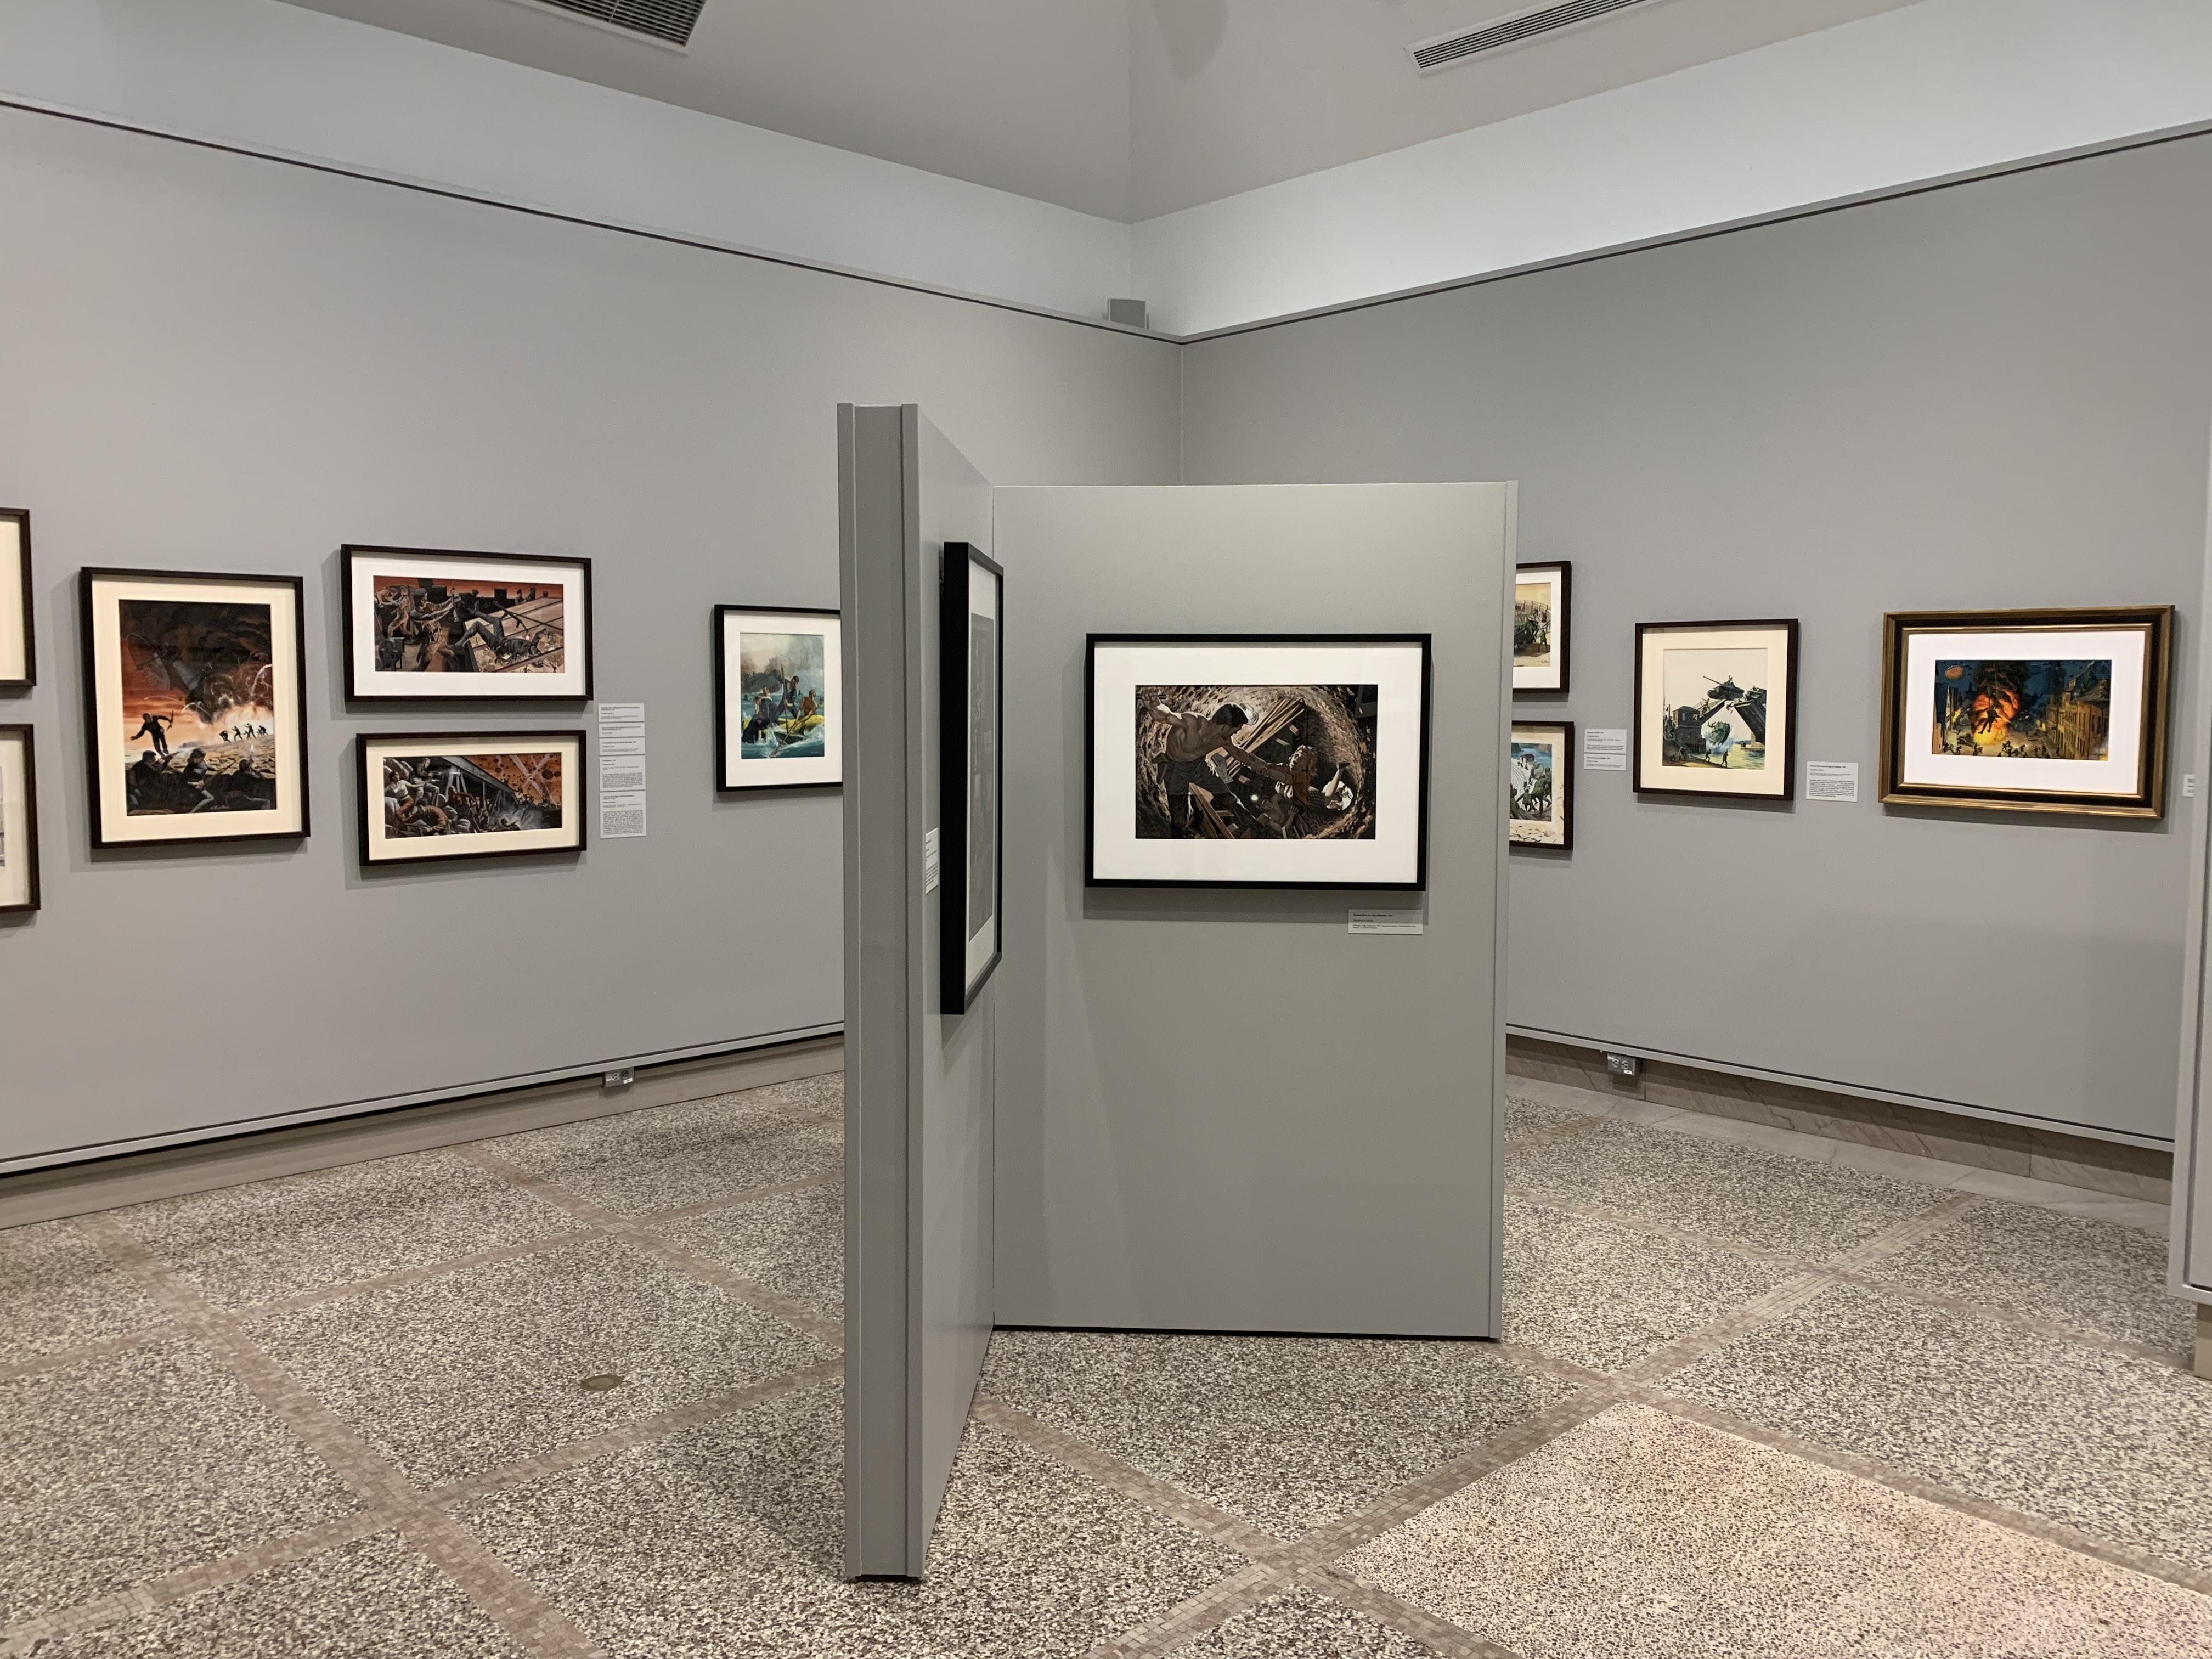 Photo courtesy of Heckscher Museum of Art